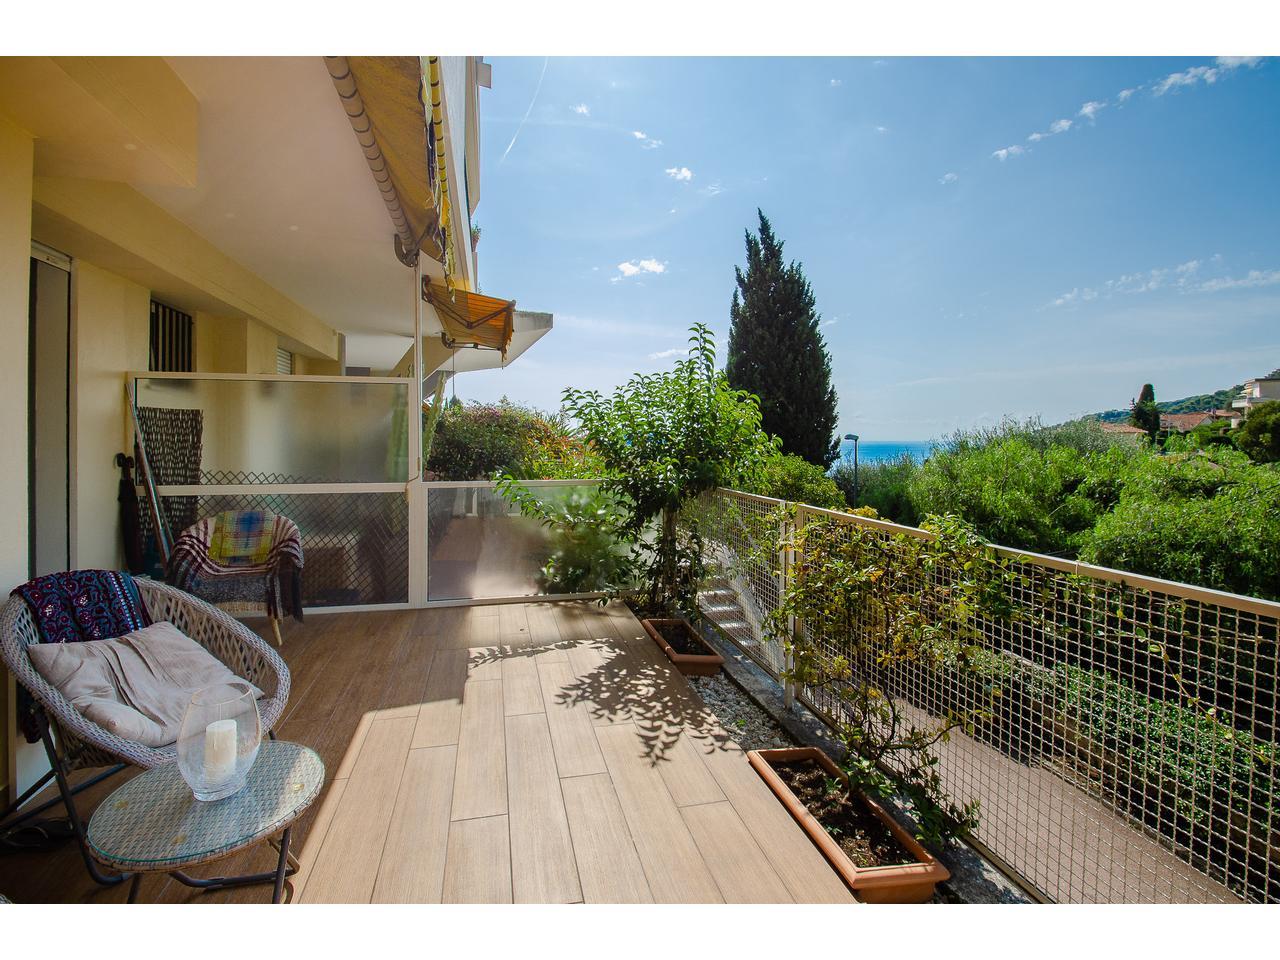 Grand Immobilier Nice Vue Mer Appartement Villefranche Sur Mer Studio Avec Jolie Vue  Mer Et Terrasse A Vendre